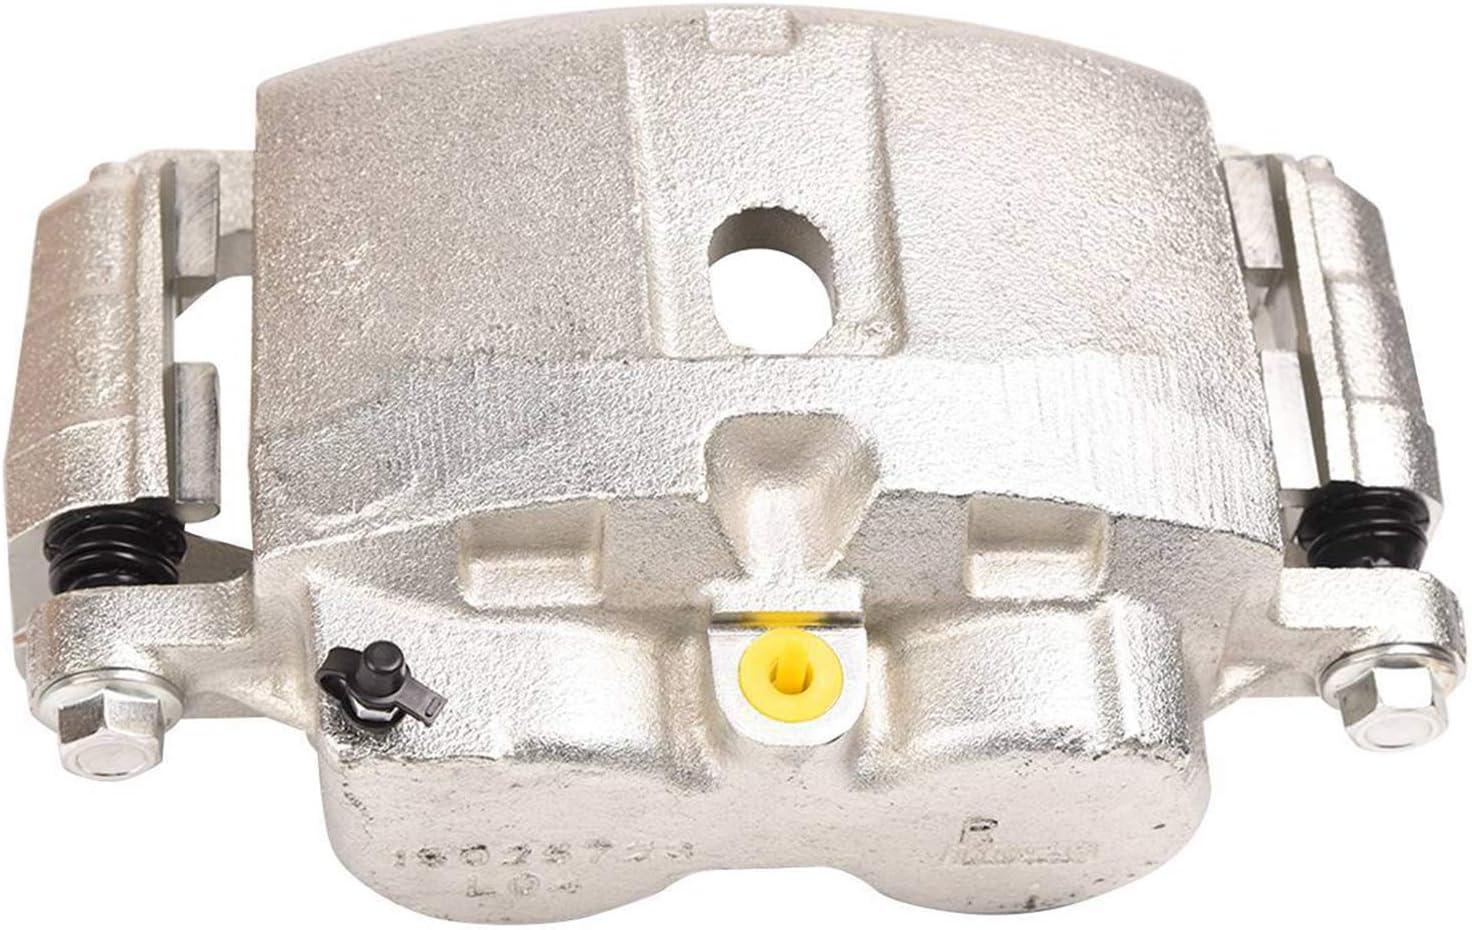 Right Brake Caliper Kit Compatible with Chevrolet Avalanche Silverado GMC Savana Sierra Hummer H2 Bapmic 18B4730 18B4731 Front Left